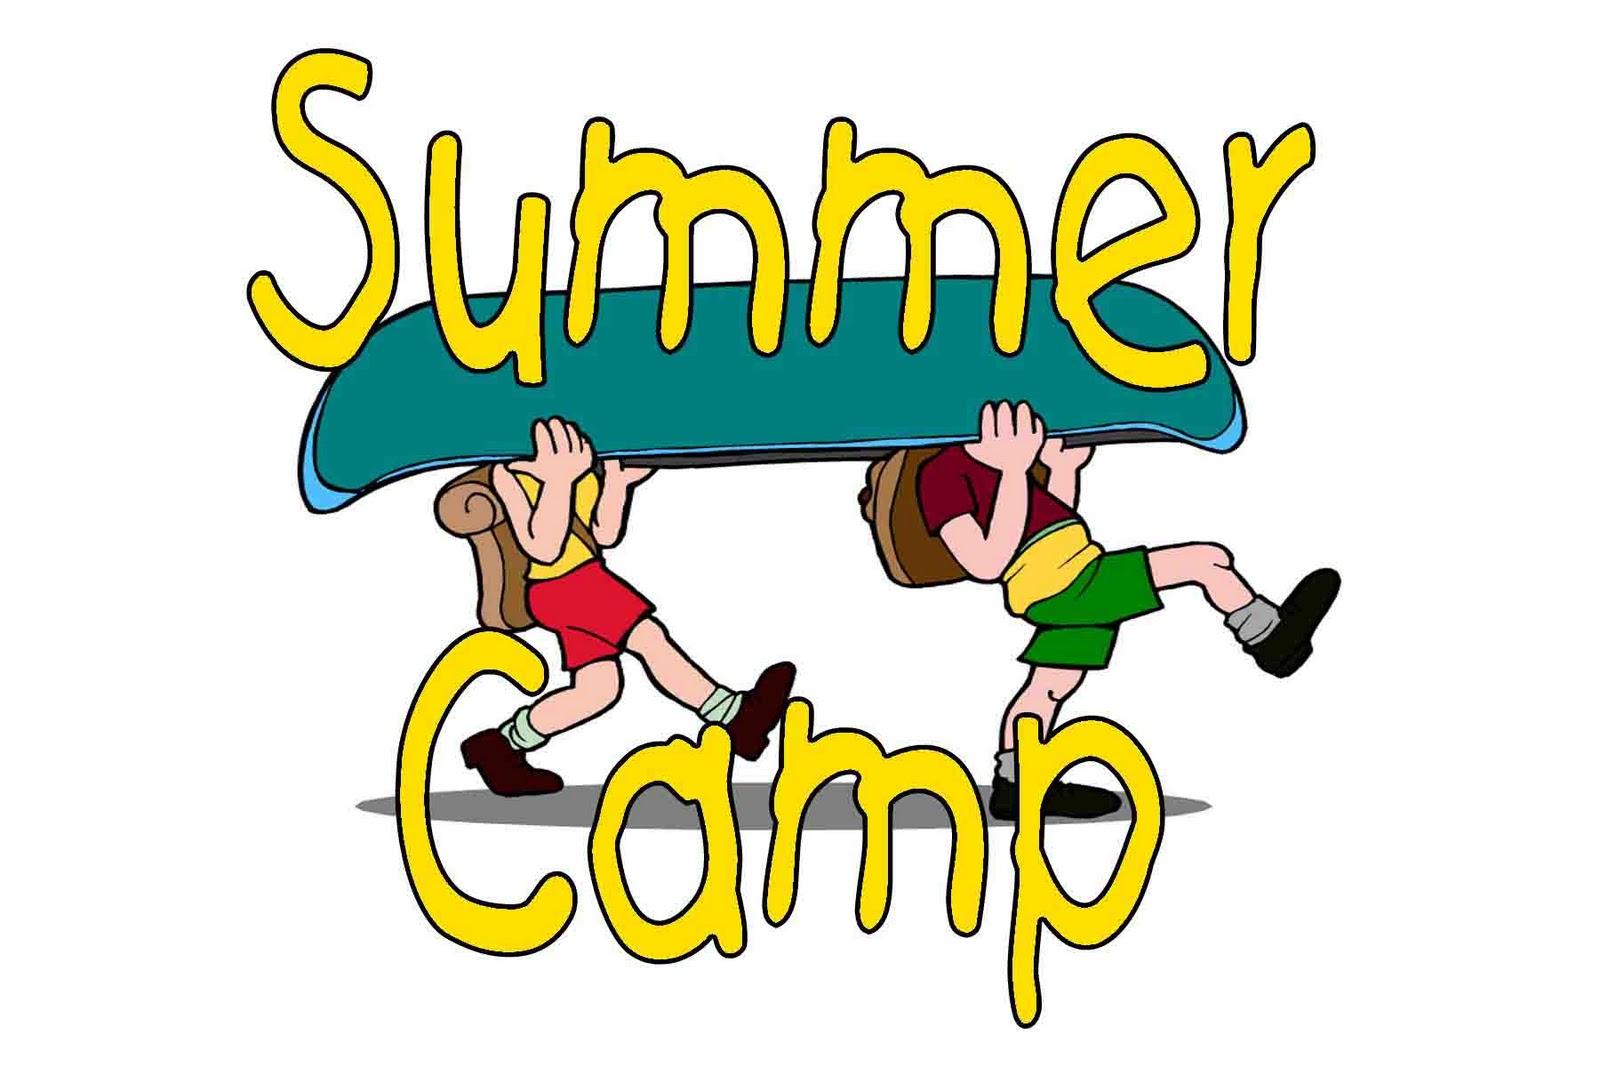 hight resolution of kids kids adventure clipart summer image for clipart co kckbygnki adventure adventure camp clipart